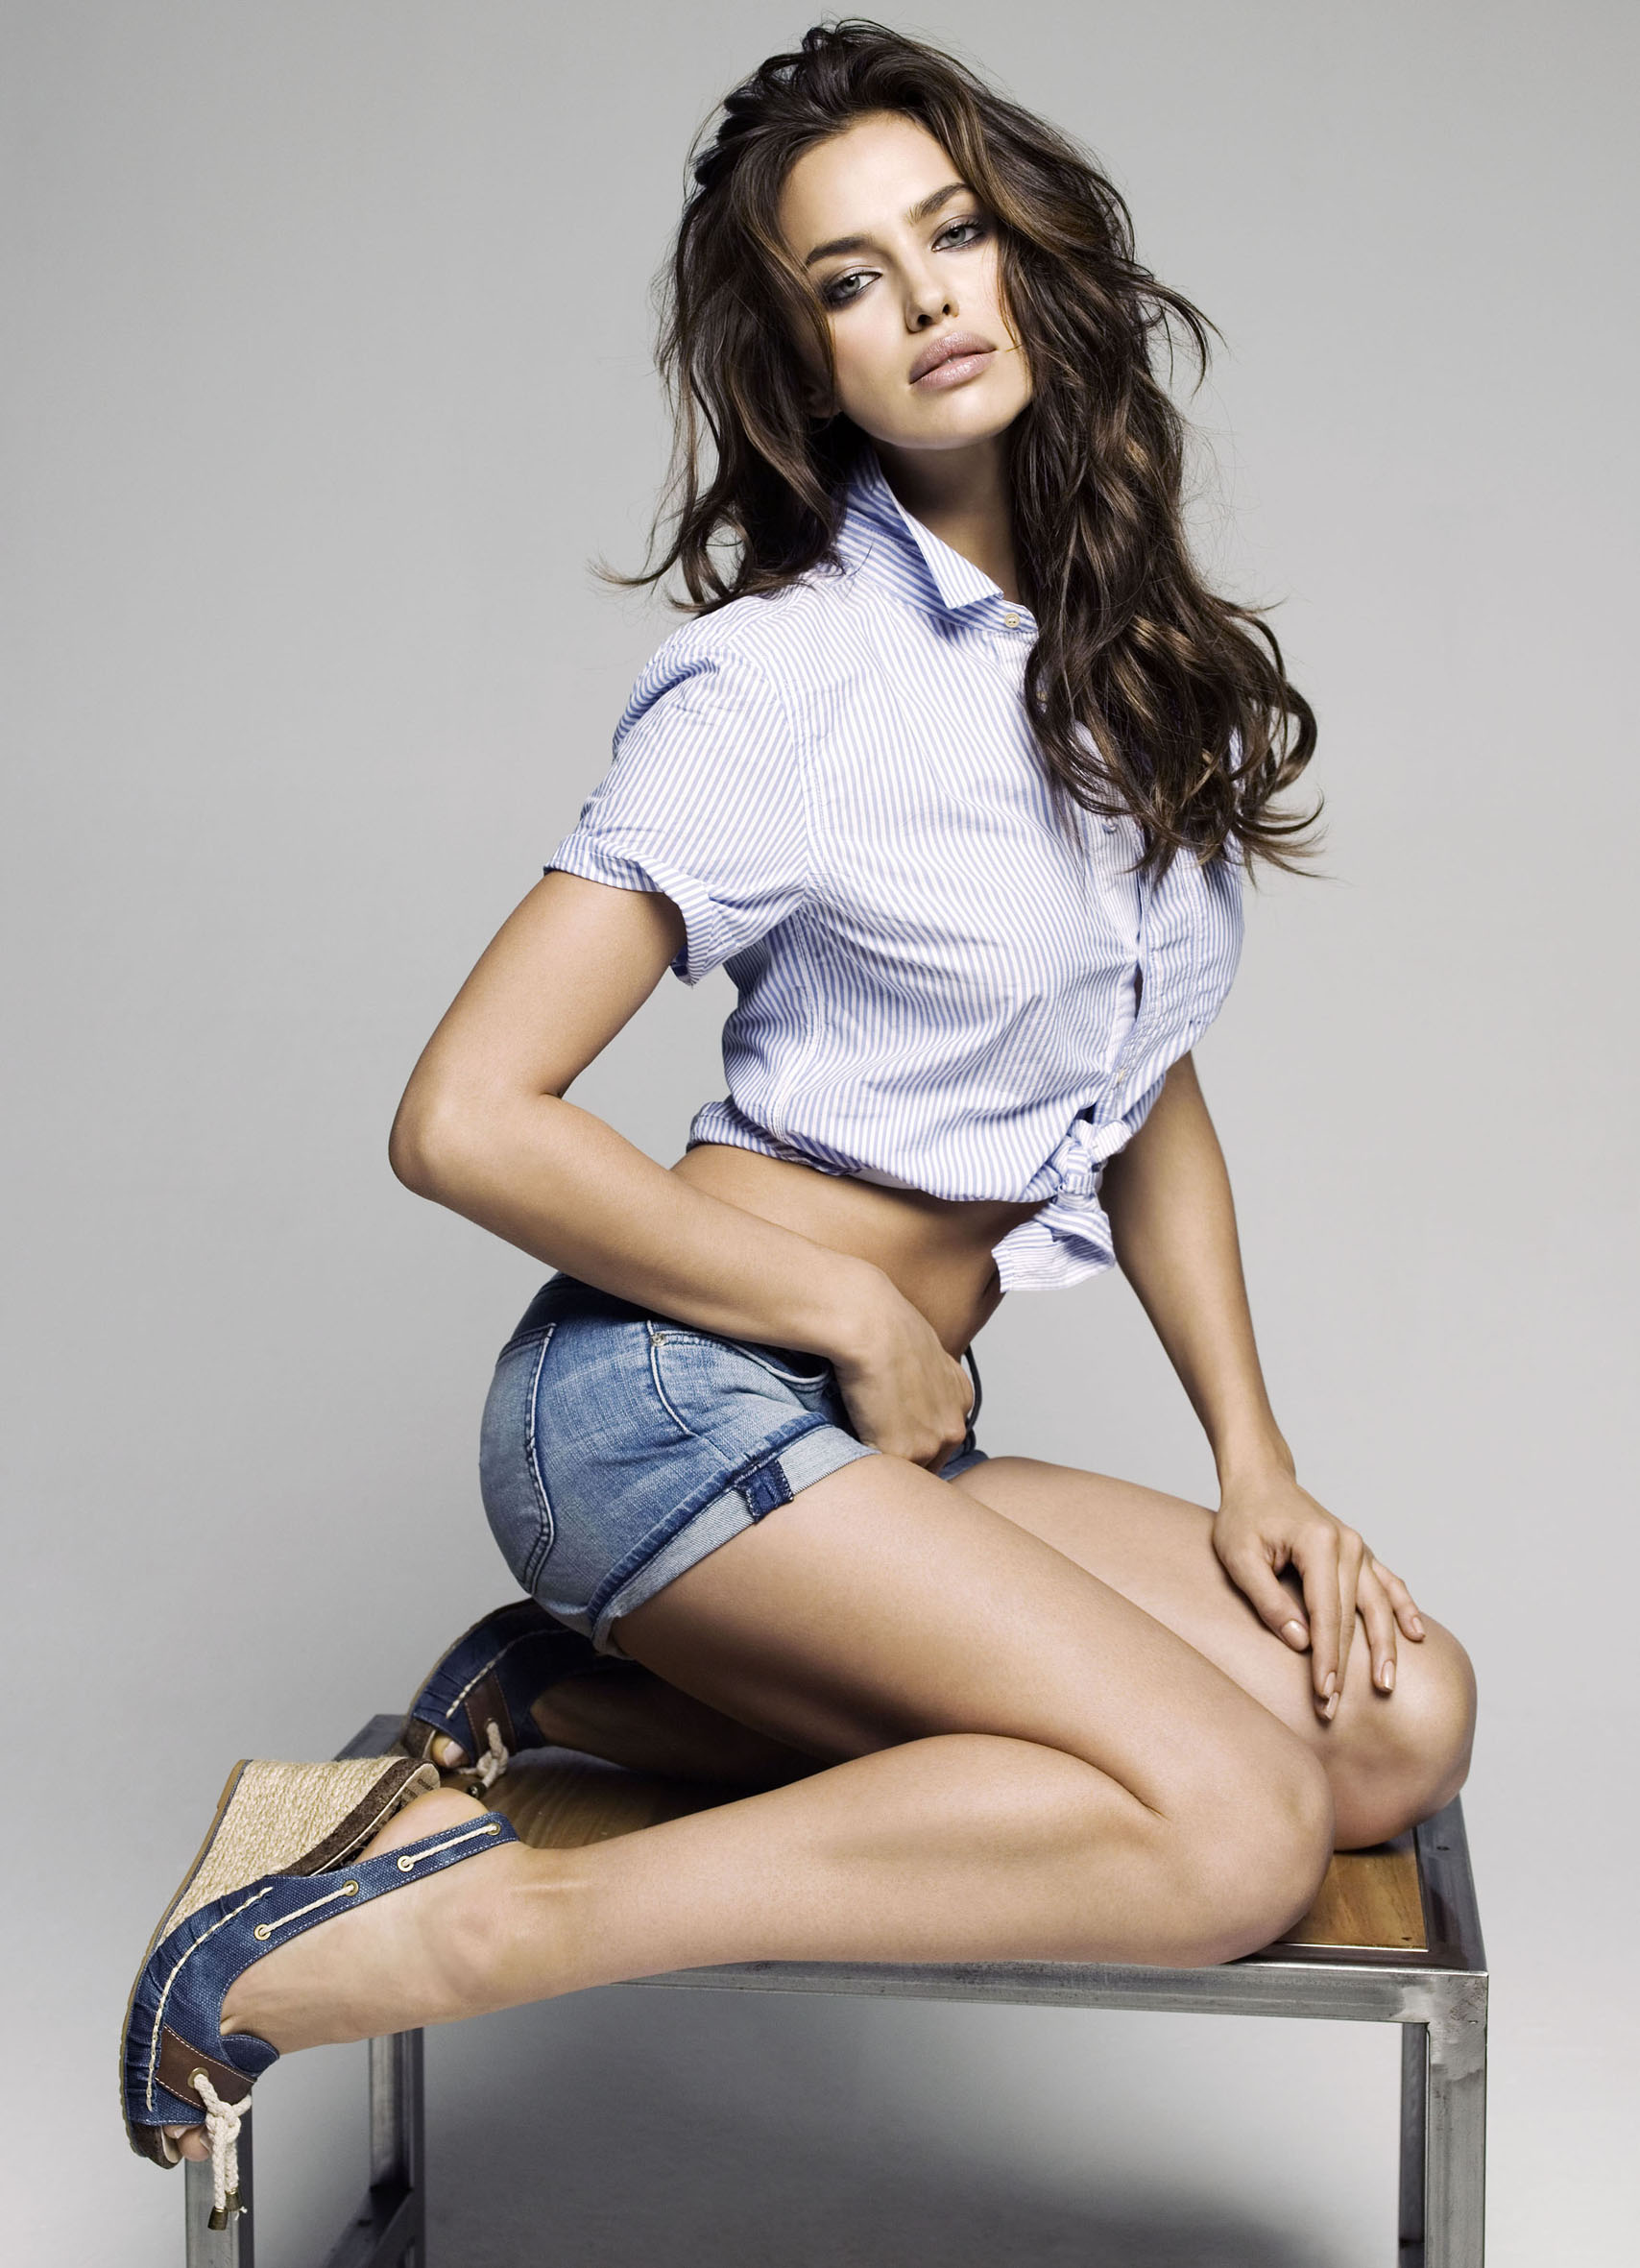 http://www.gotceleb.com/wp-content/uploads/celebrities/irina-shayk/xti-photoshoot-2012/Irina%20Shayk%20hot%20for%20XTi%20Campaign%20%202012-02.jpg